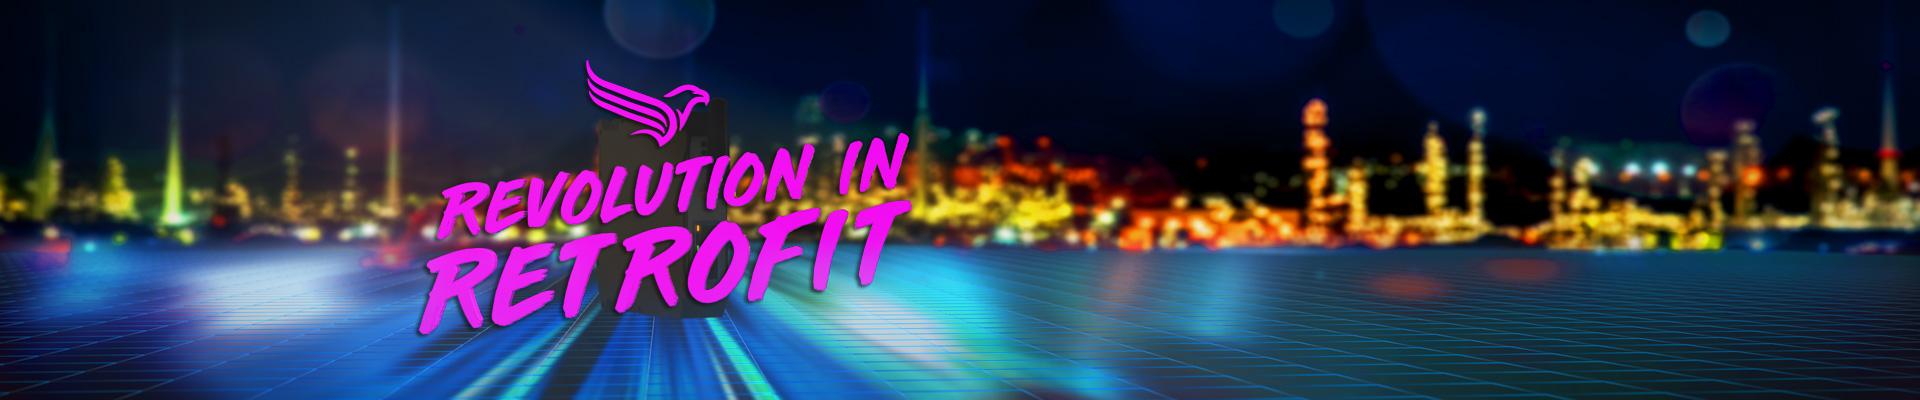 HMI-2018-Retrofit